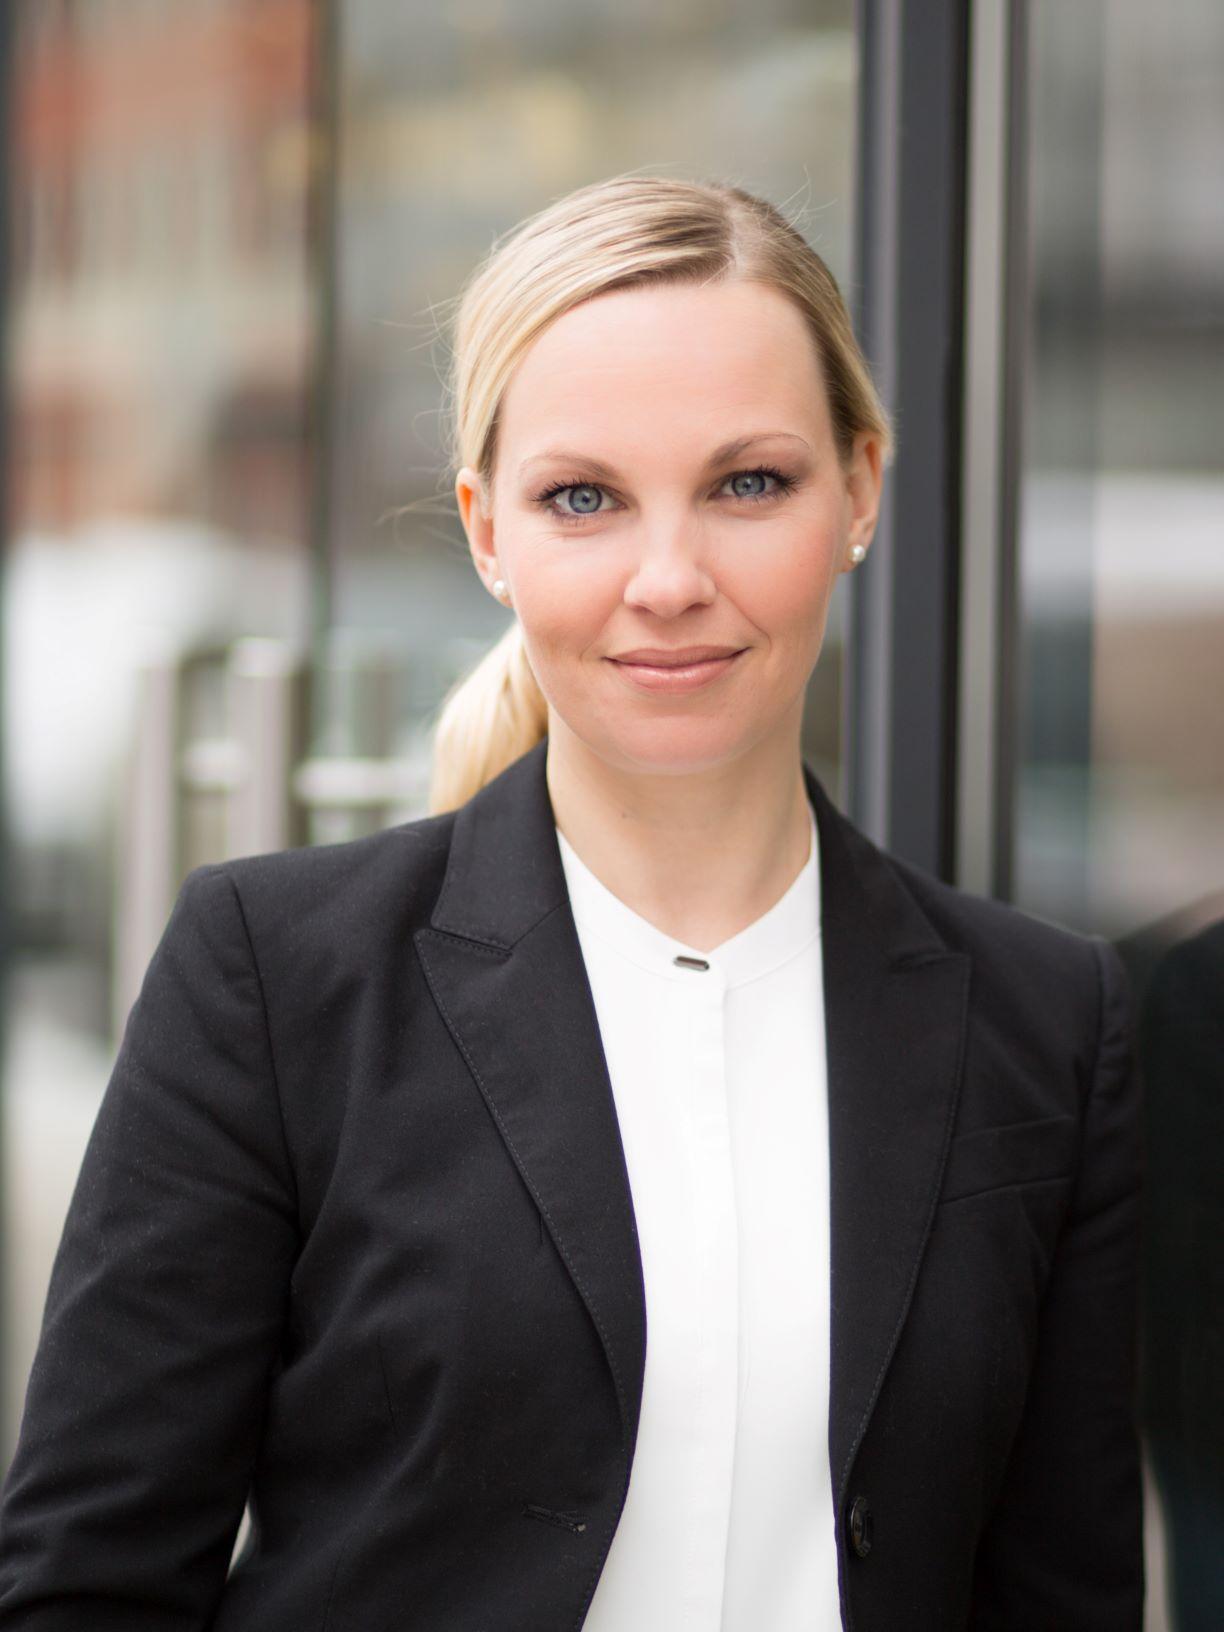 Sonja Goehrlich